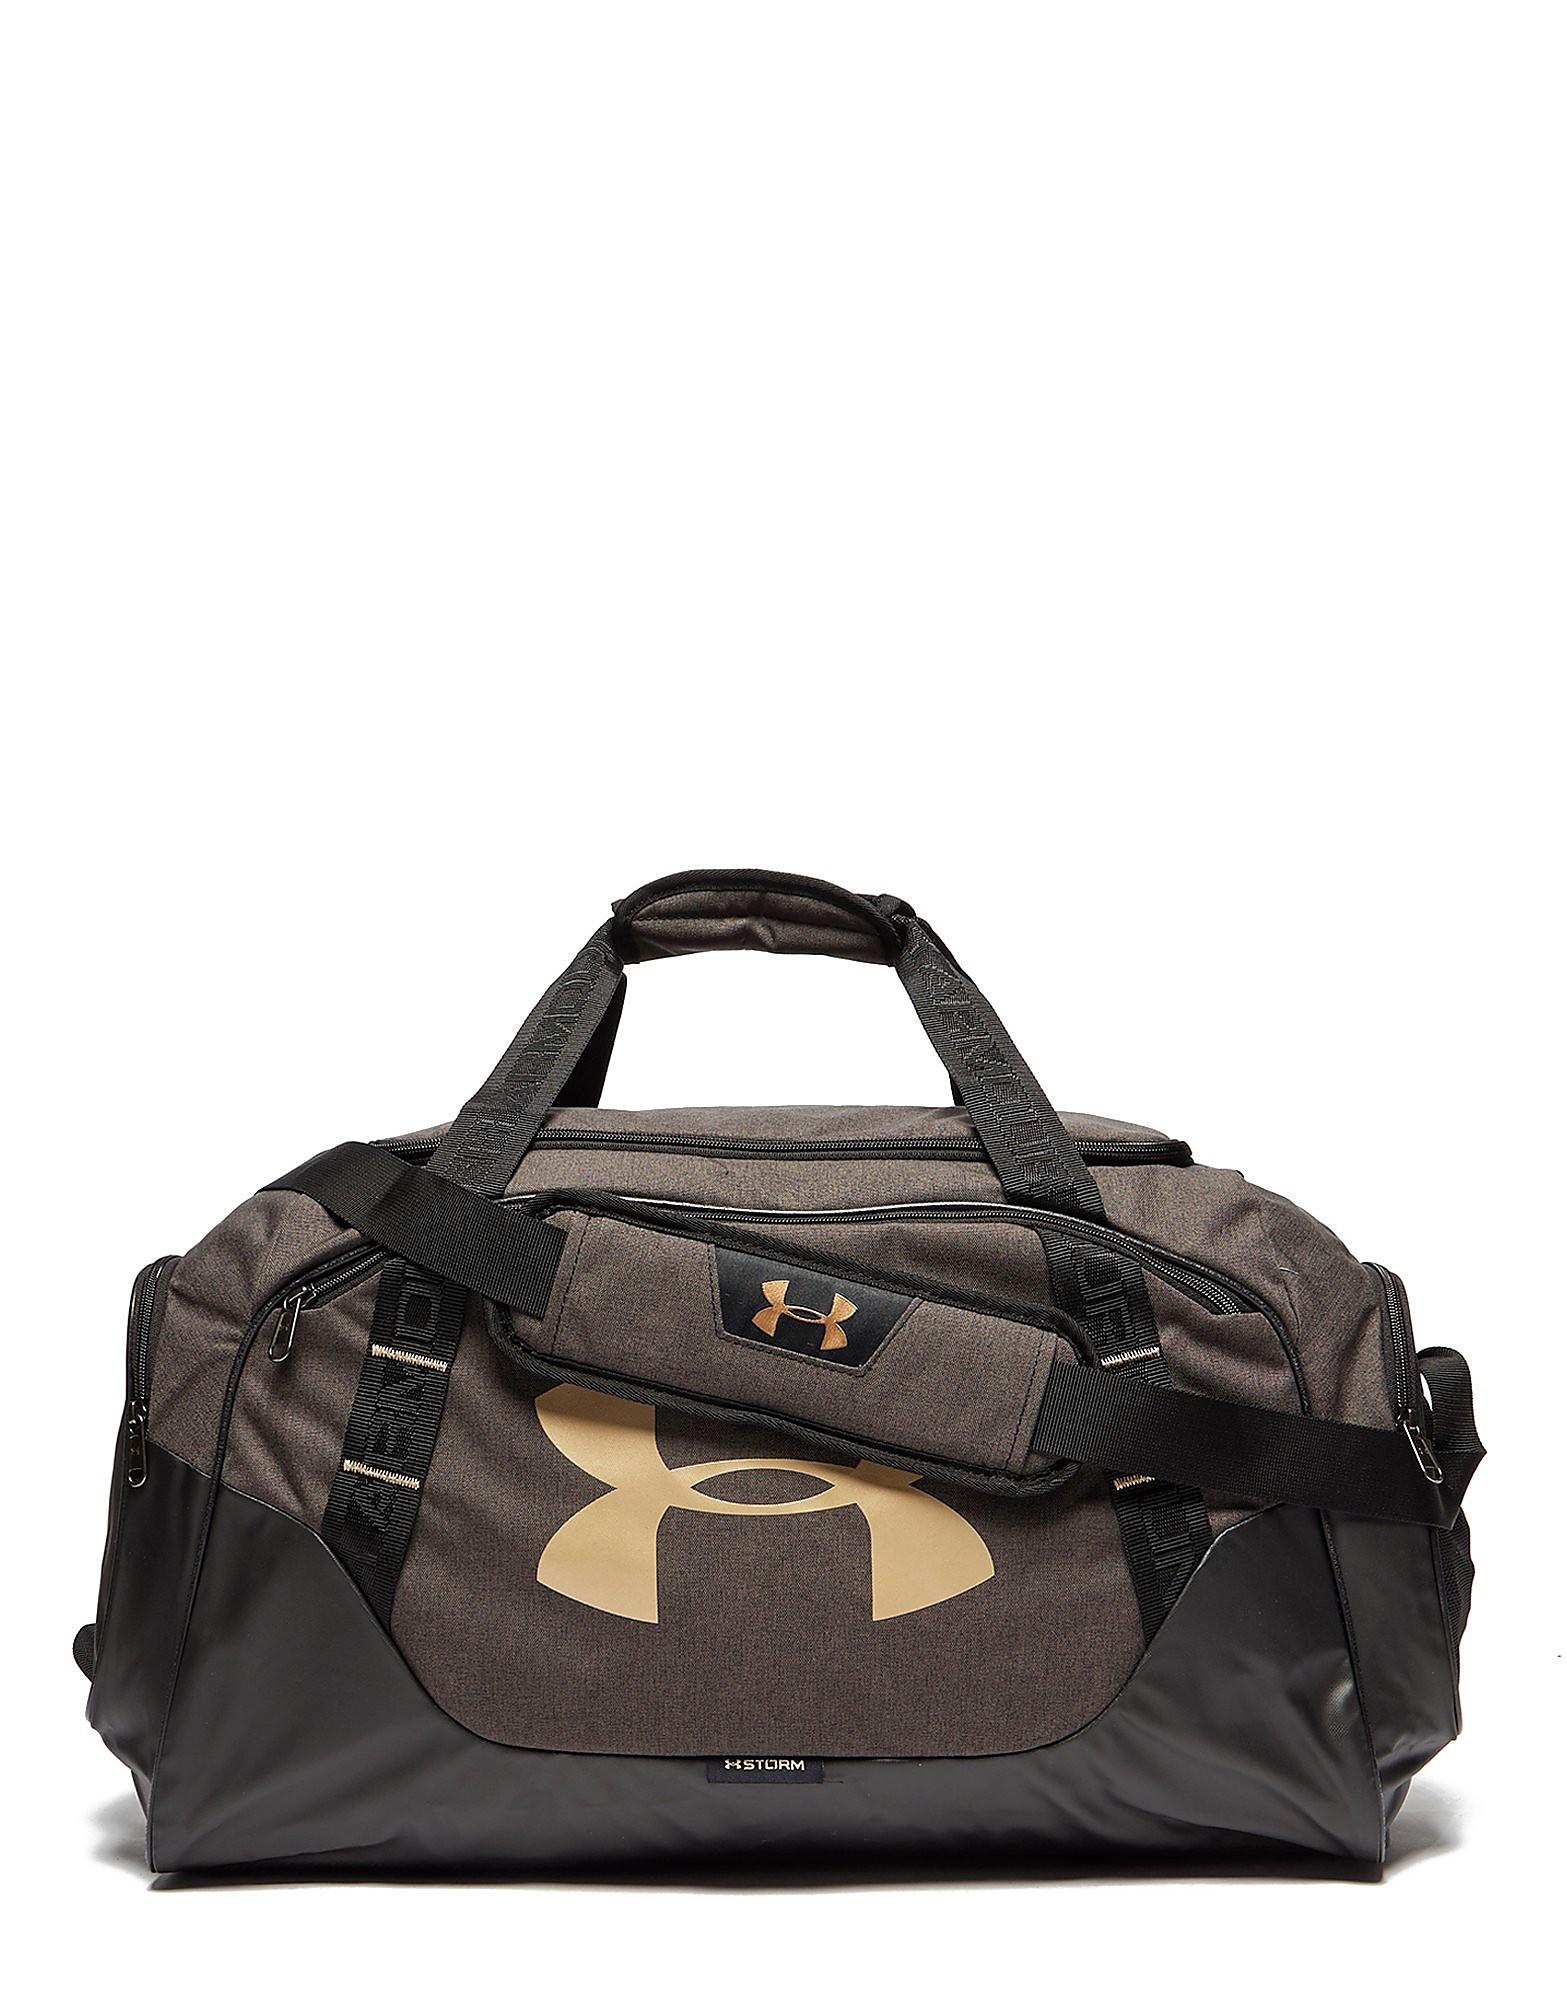 Under Armour UA Storm Undeniable 3.0 56L Medium Duffel Bag